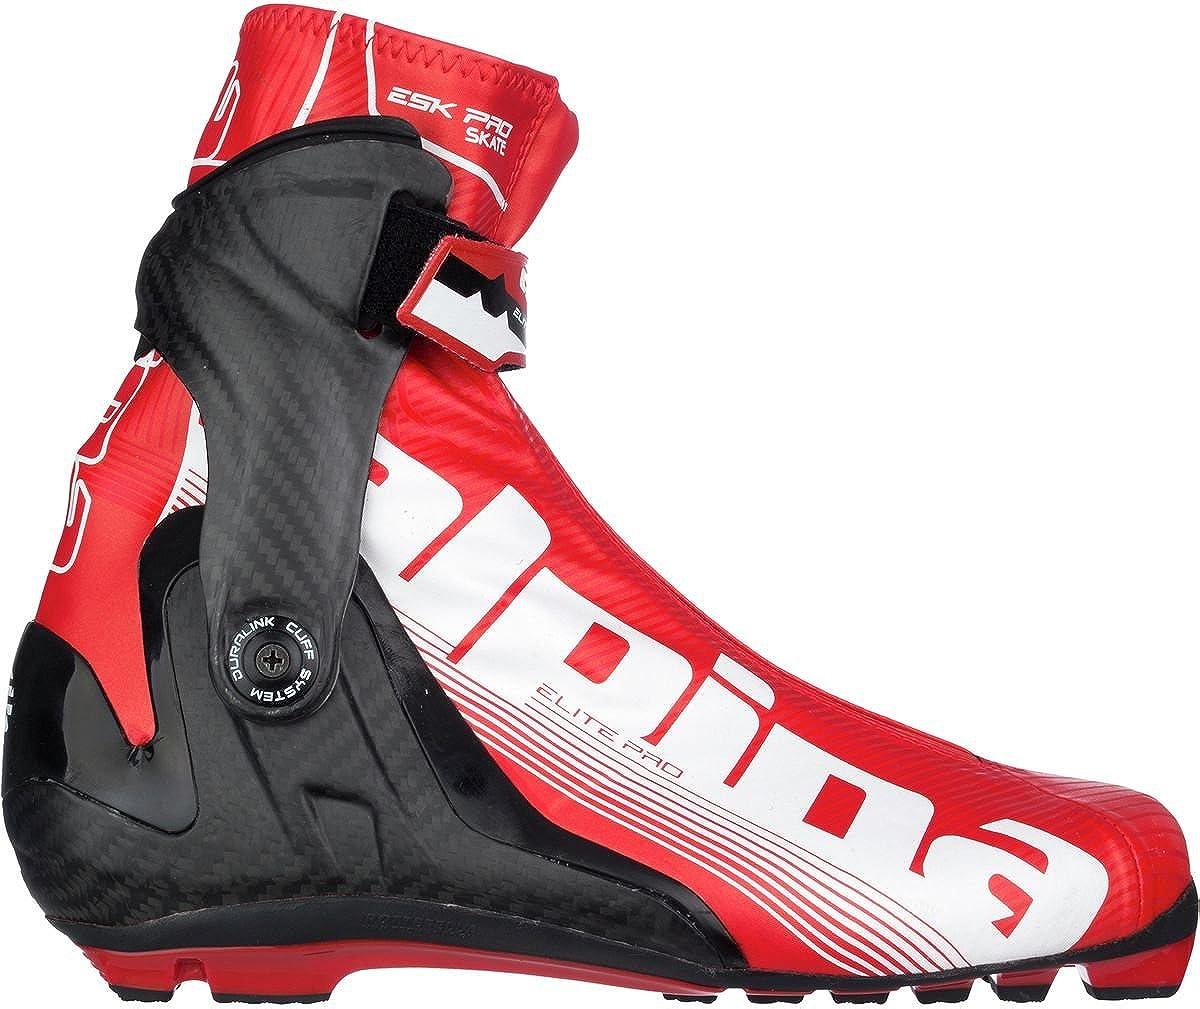 Alpina Unisex ESK 25% OFF Pro Skate Boots WC Luxury goods